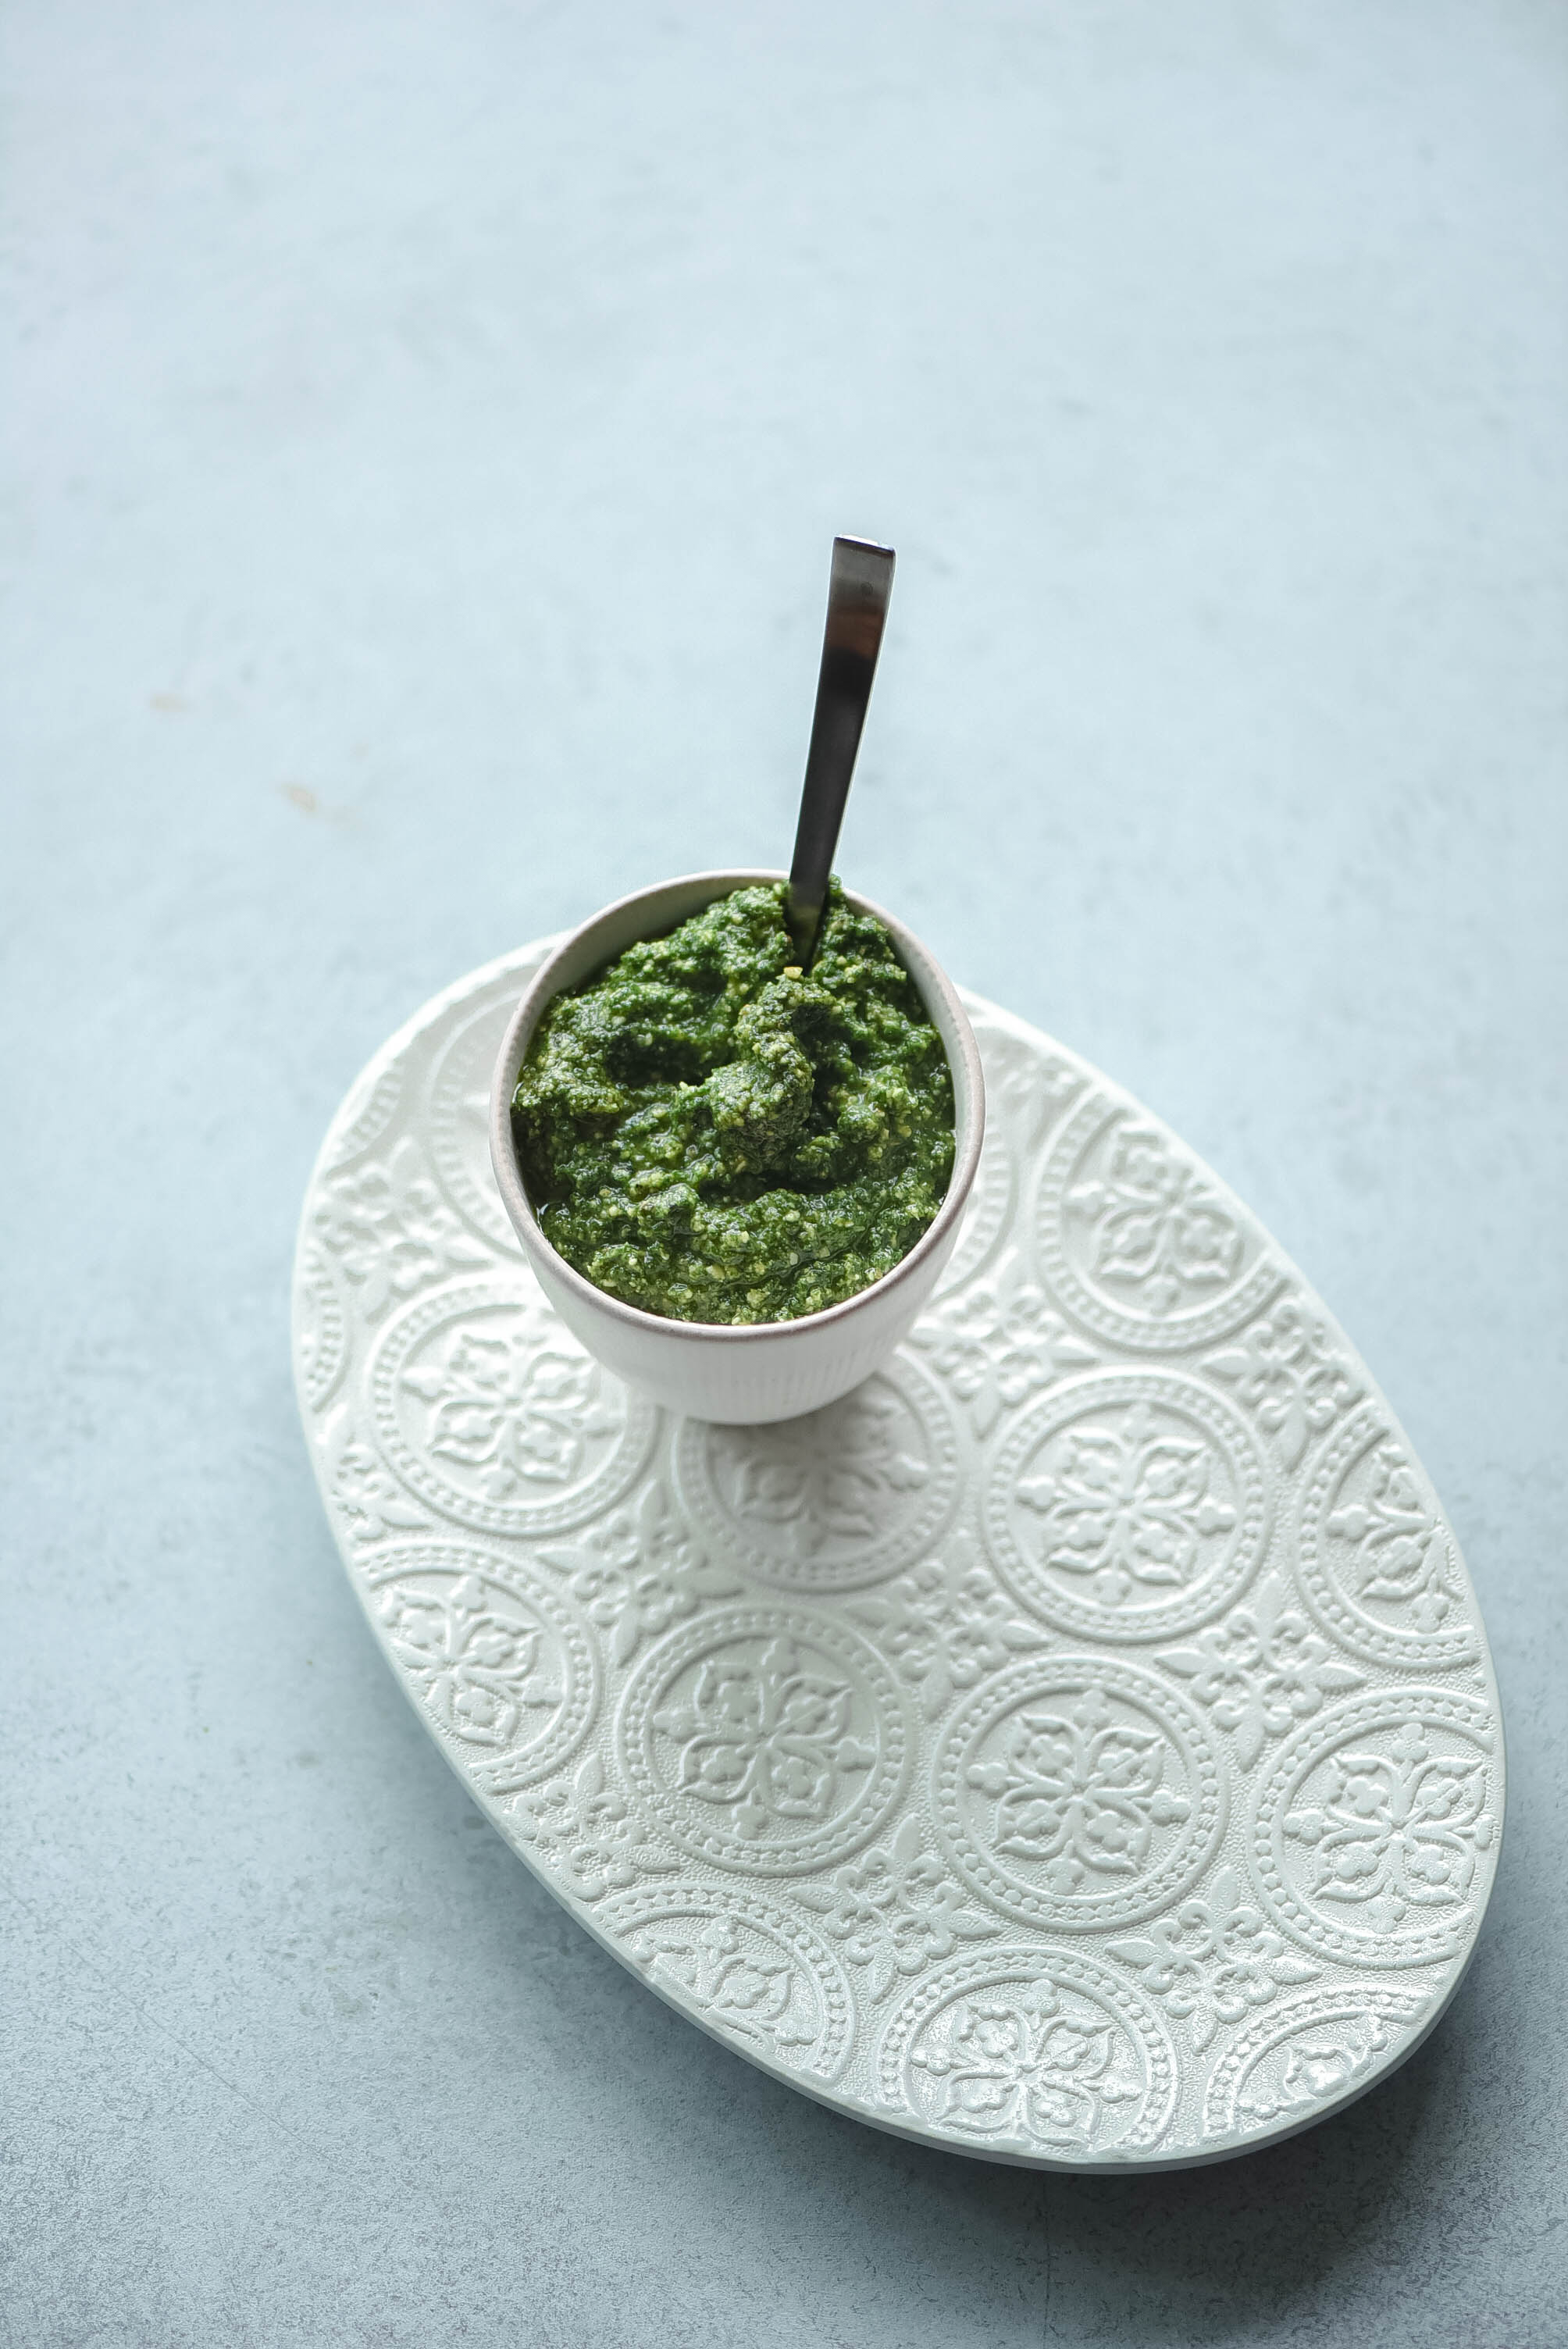 Cavolo Nero Kale and Pistachios Pesto